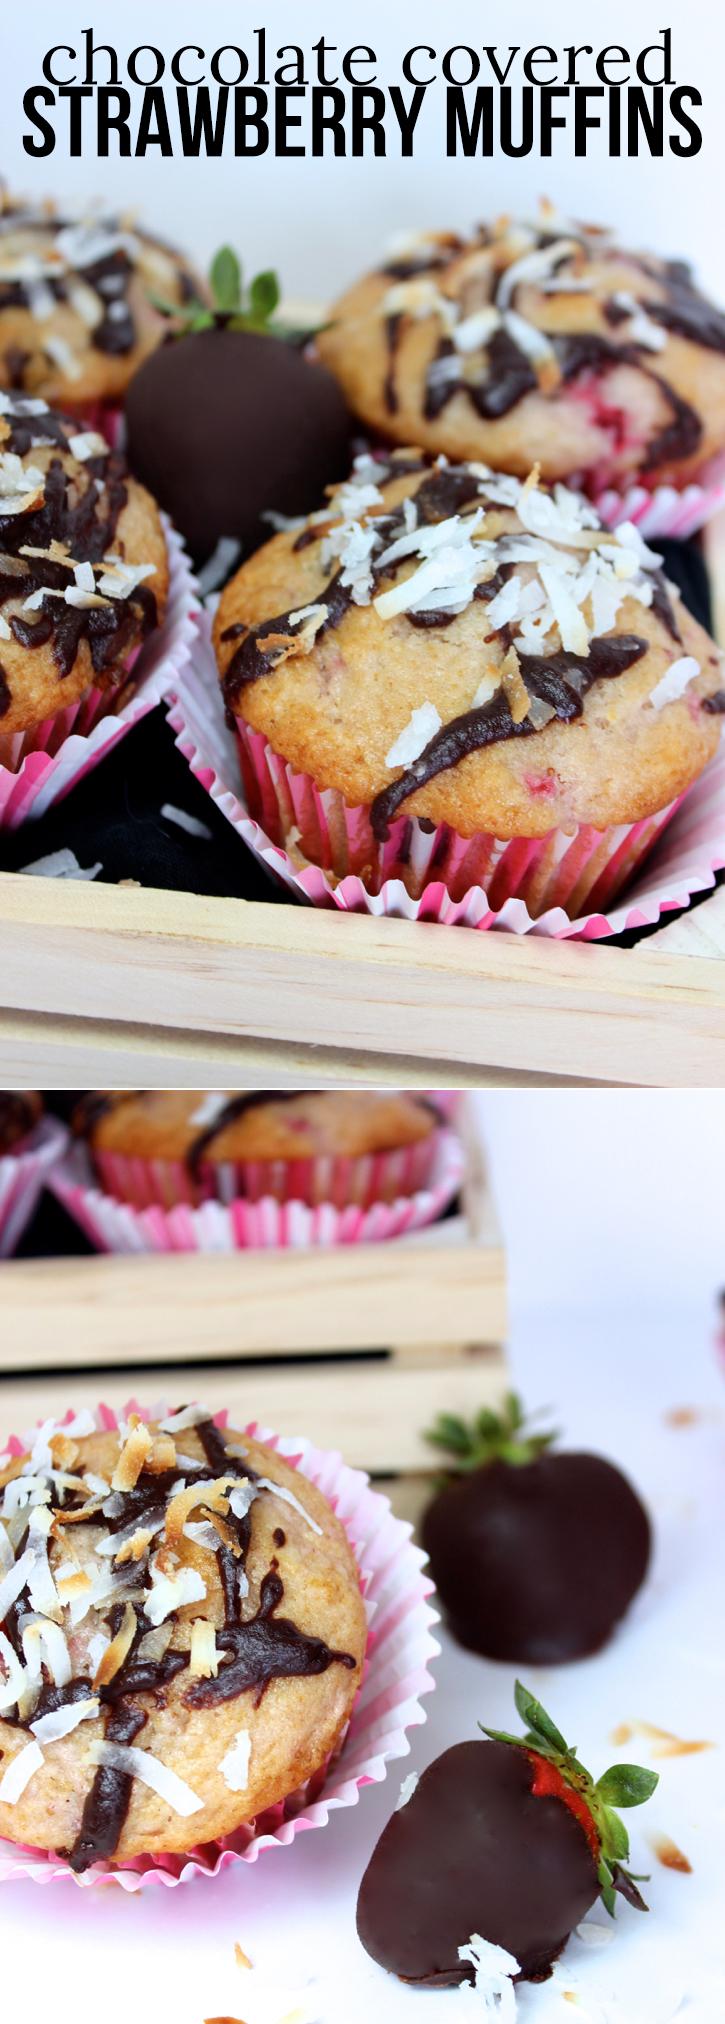 chocolate covered strawberry muffins